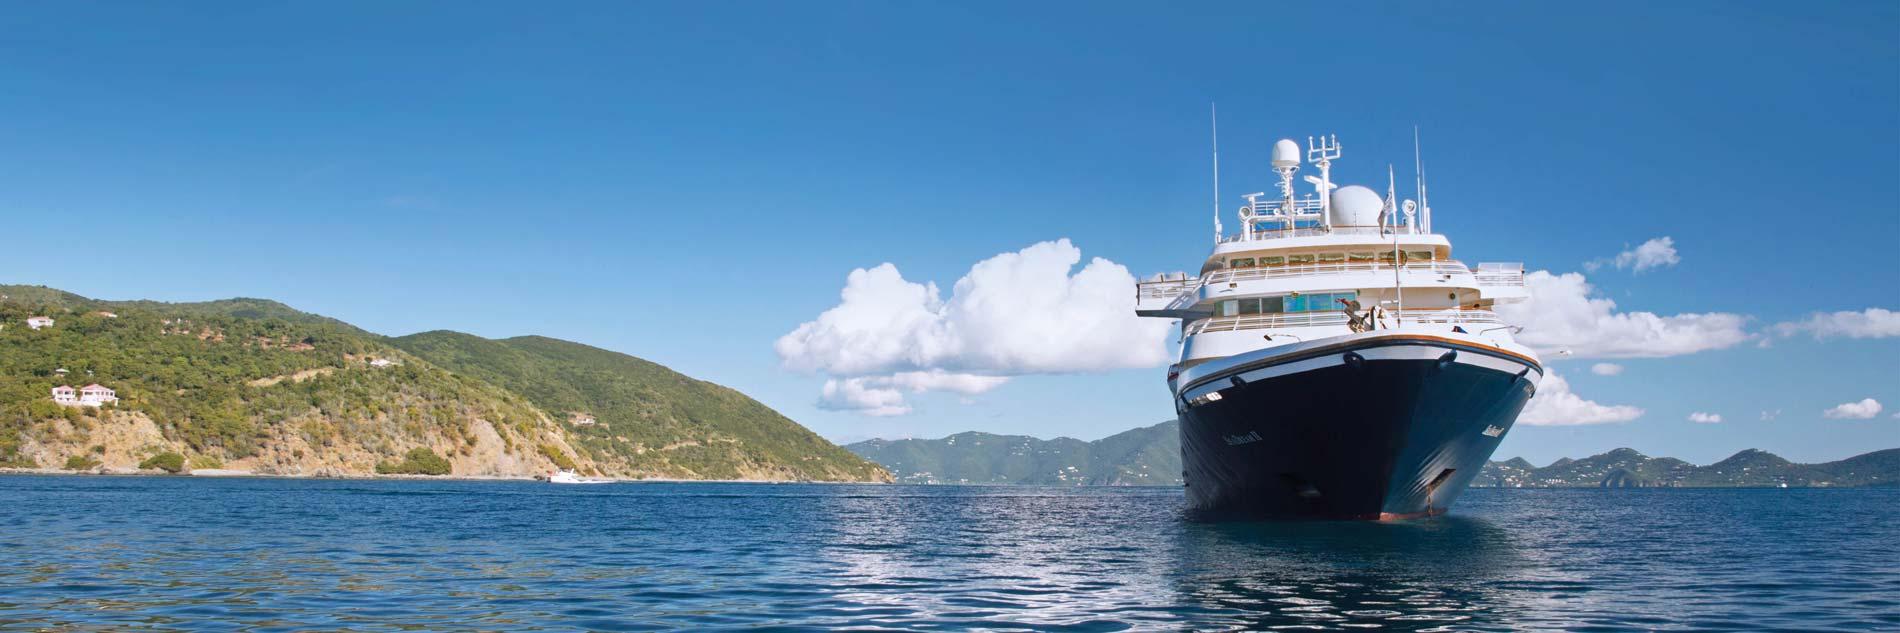 Small Inclusive Luxury Vacation Cruise Line Seadream